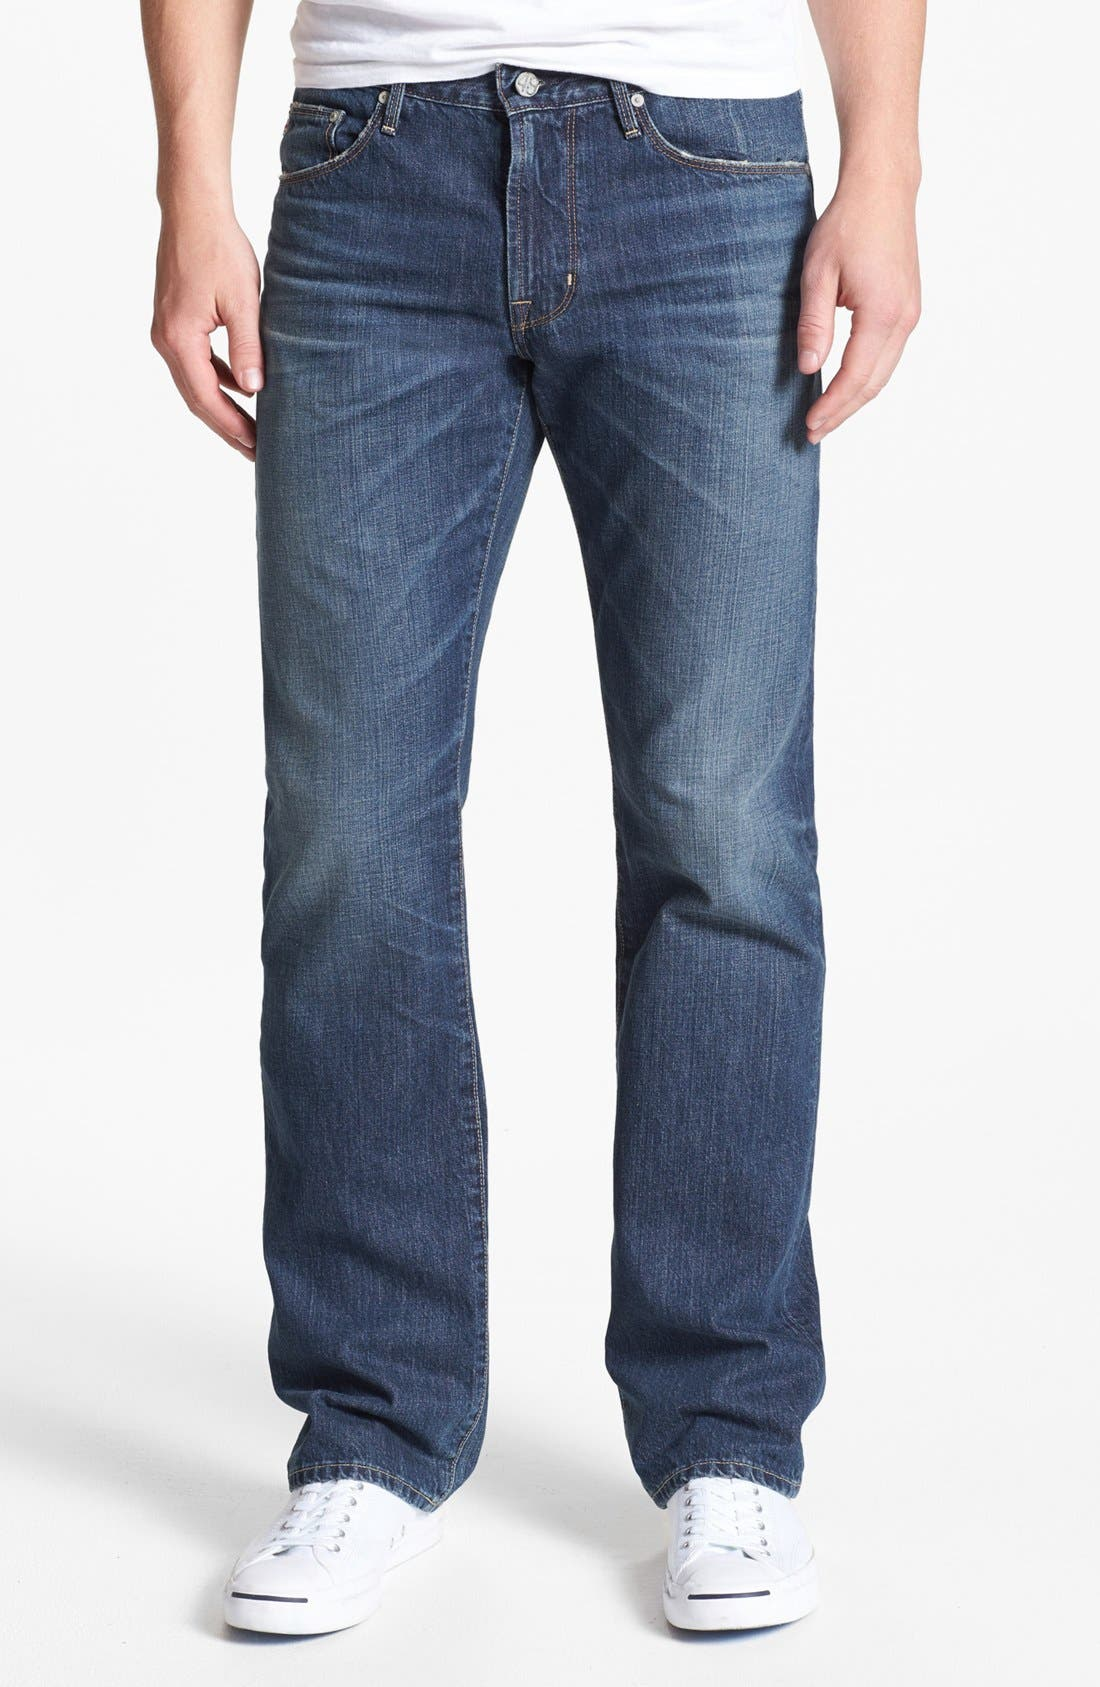 Alternate Image 1 Selected - AG 'Protégé' Straight Leg Jeans (18 Years Carve)